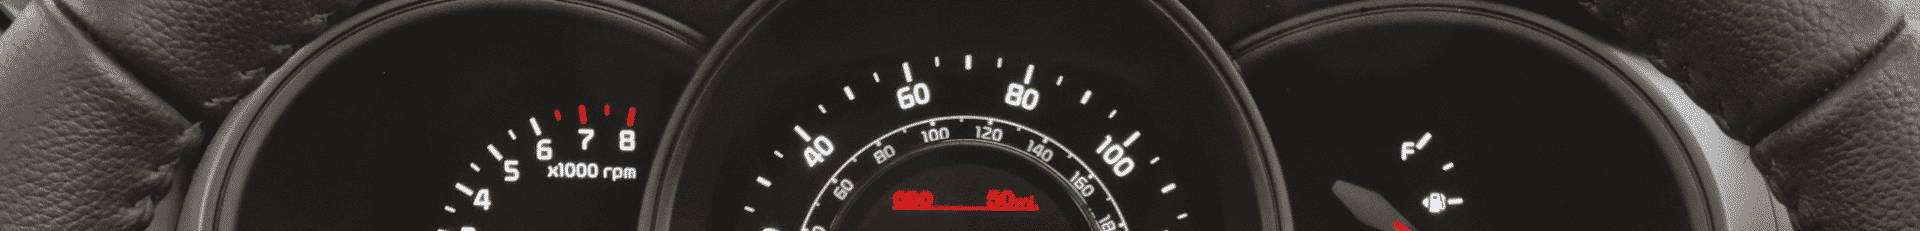 depannage-erreur-carburant